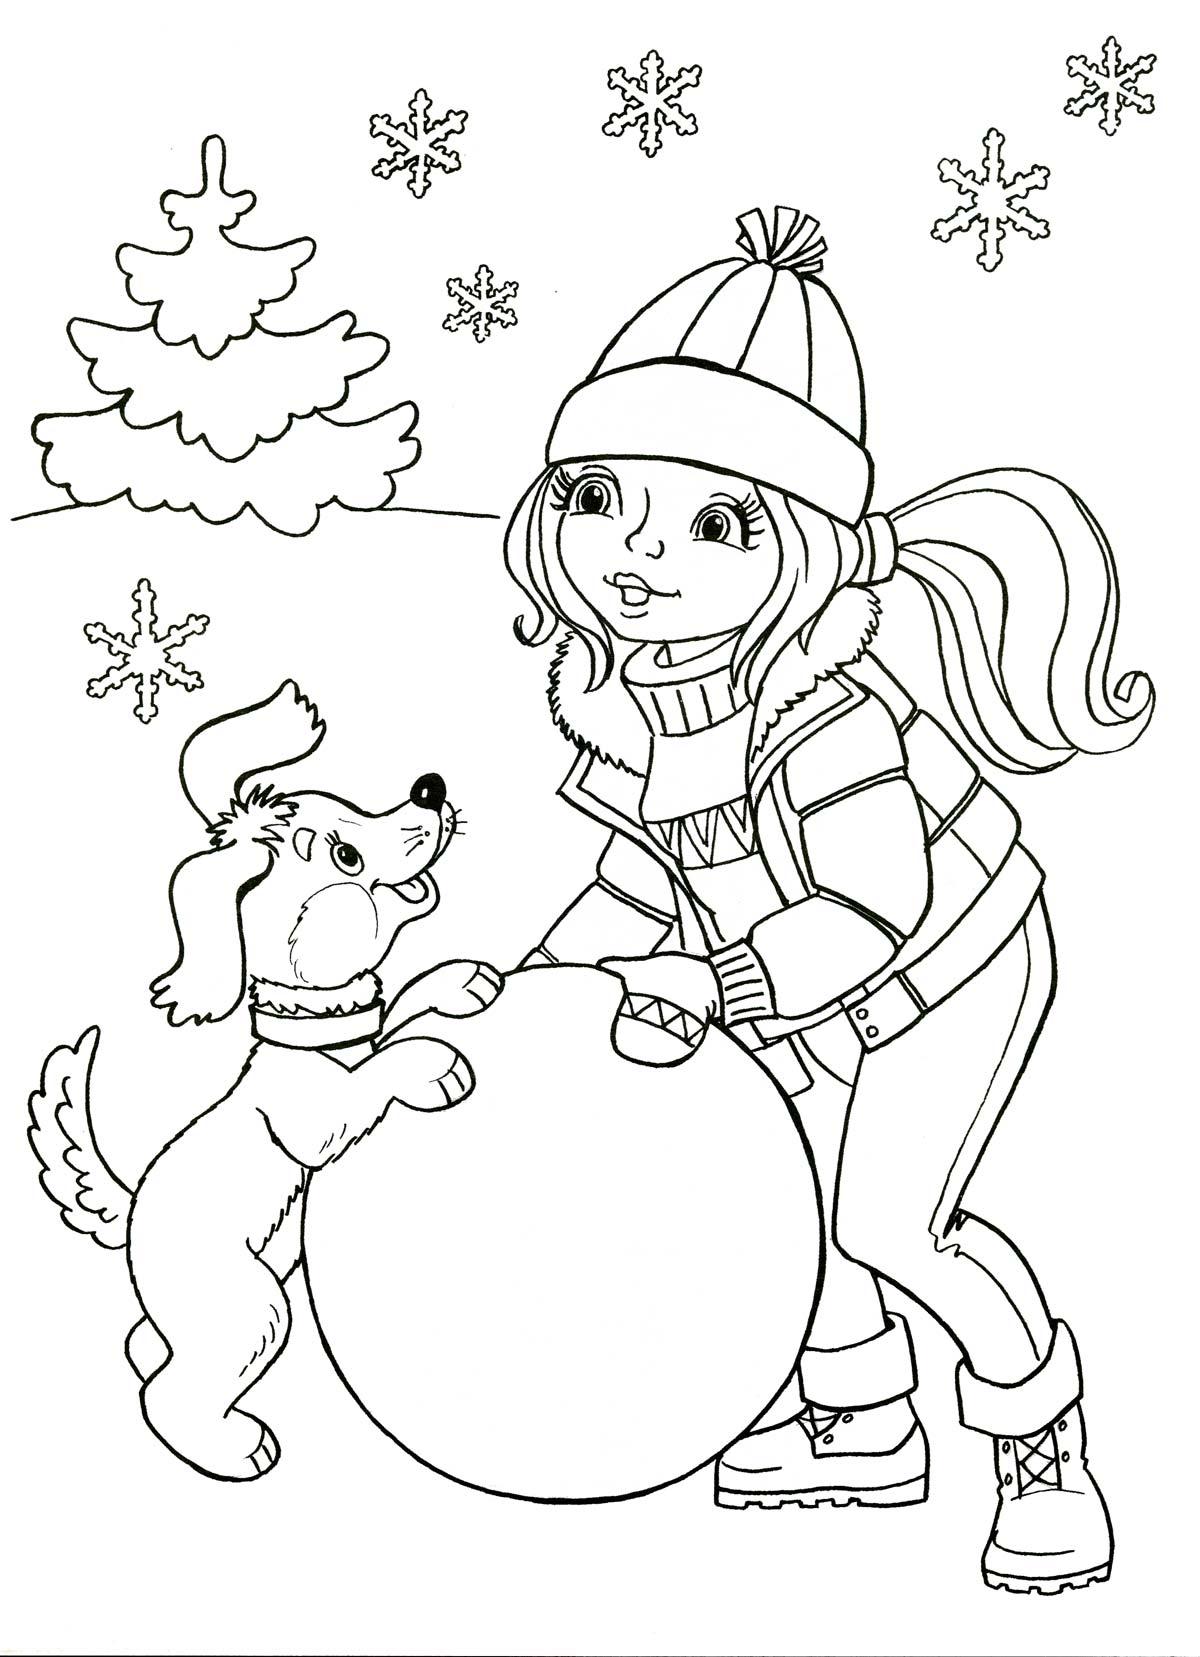 Пейзаж с елкой, девочка с собачкой Раскраски на тему зима